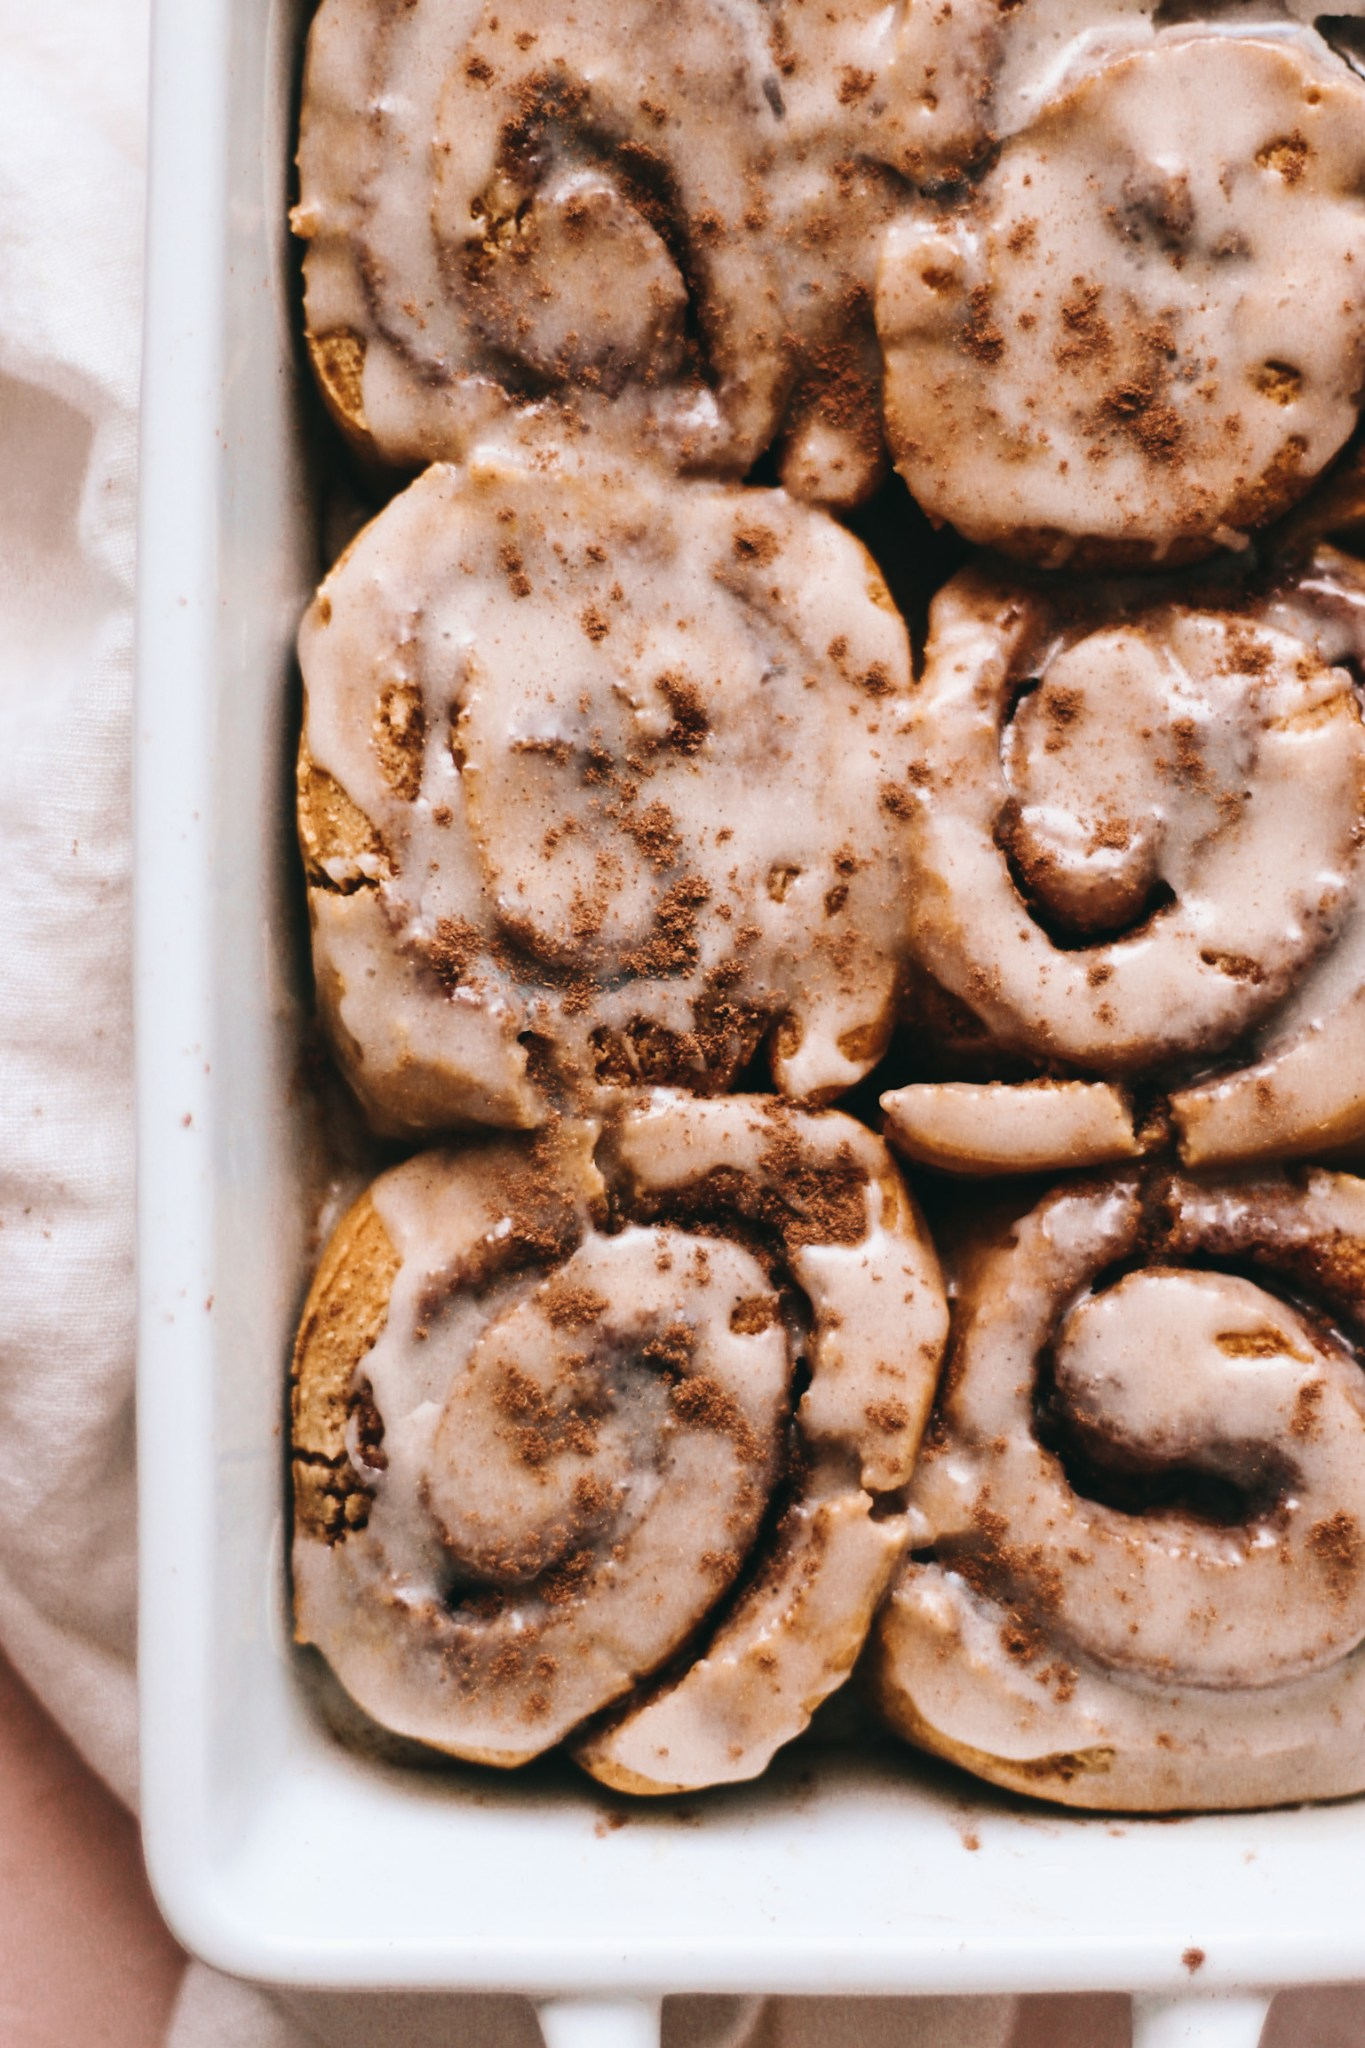 Gluten-free pumpkin cinnamon rolls